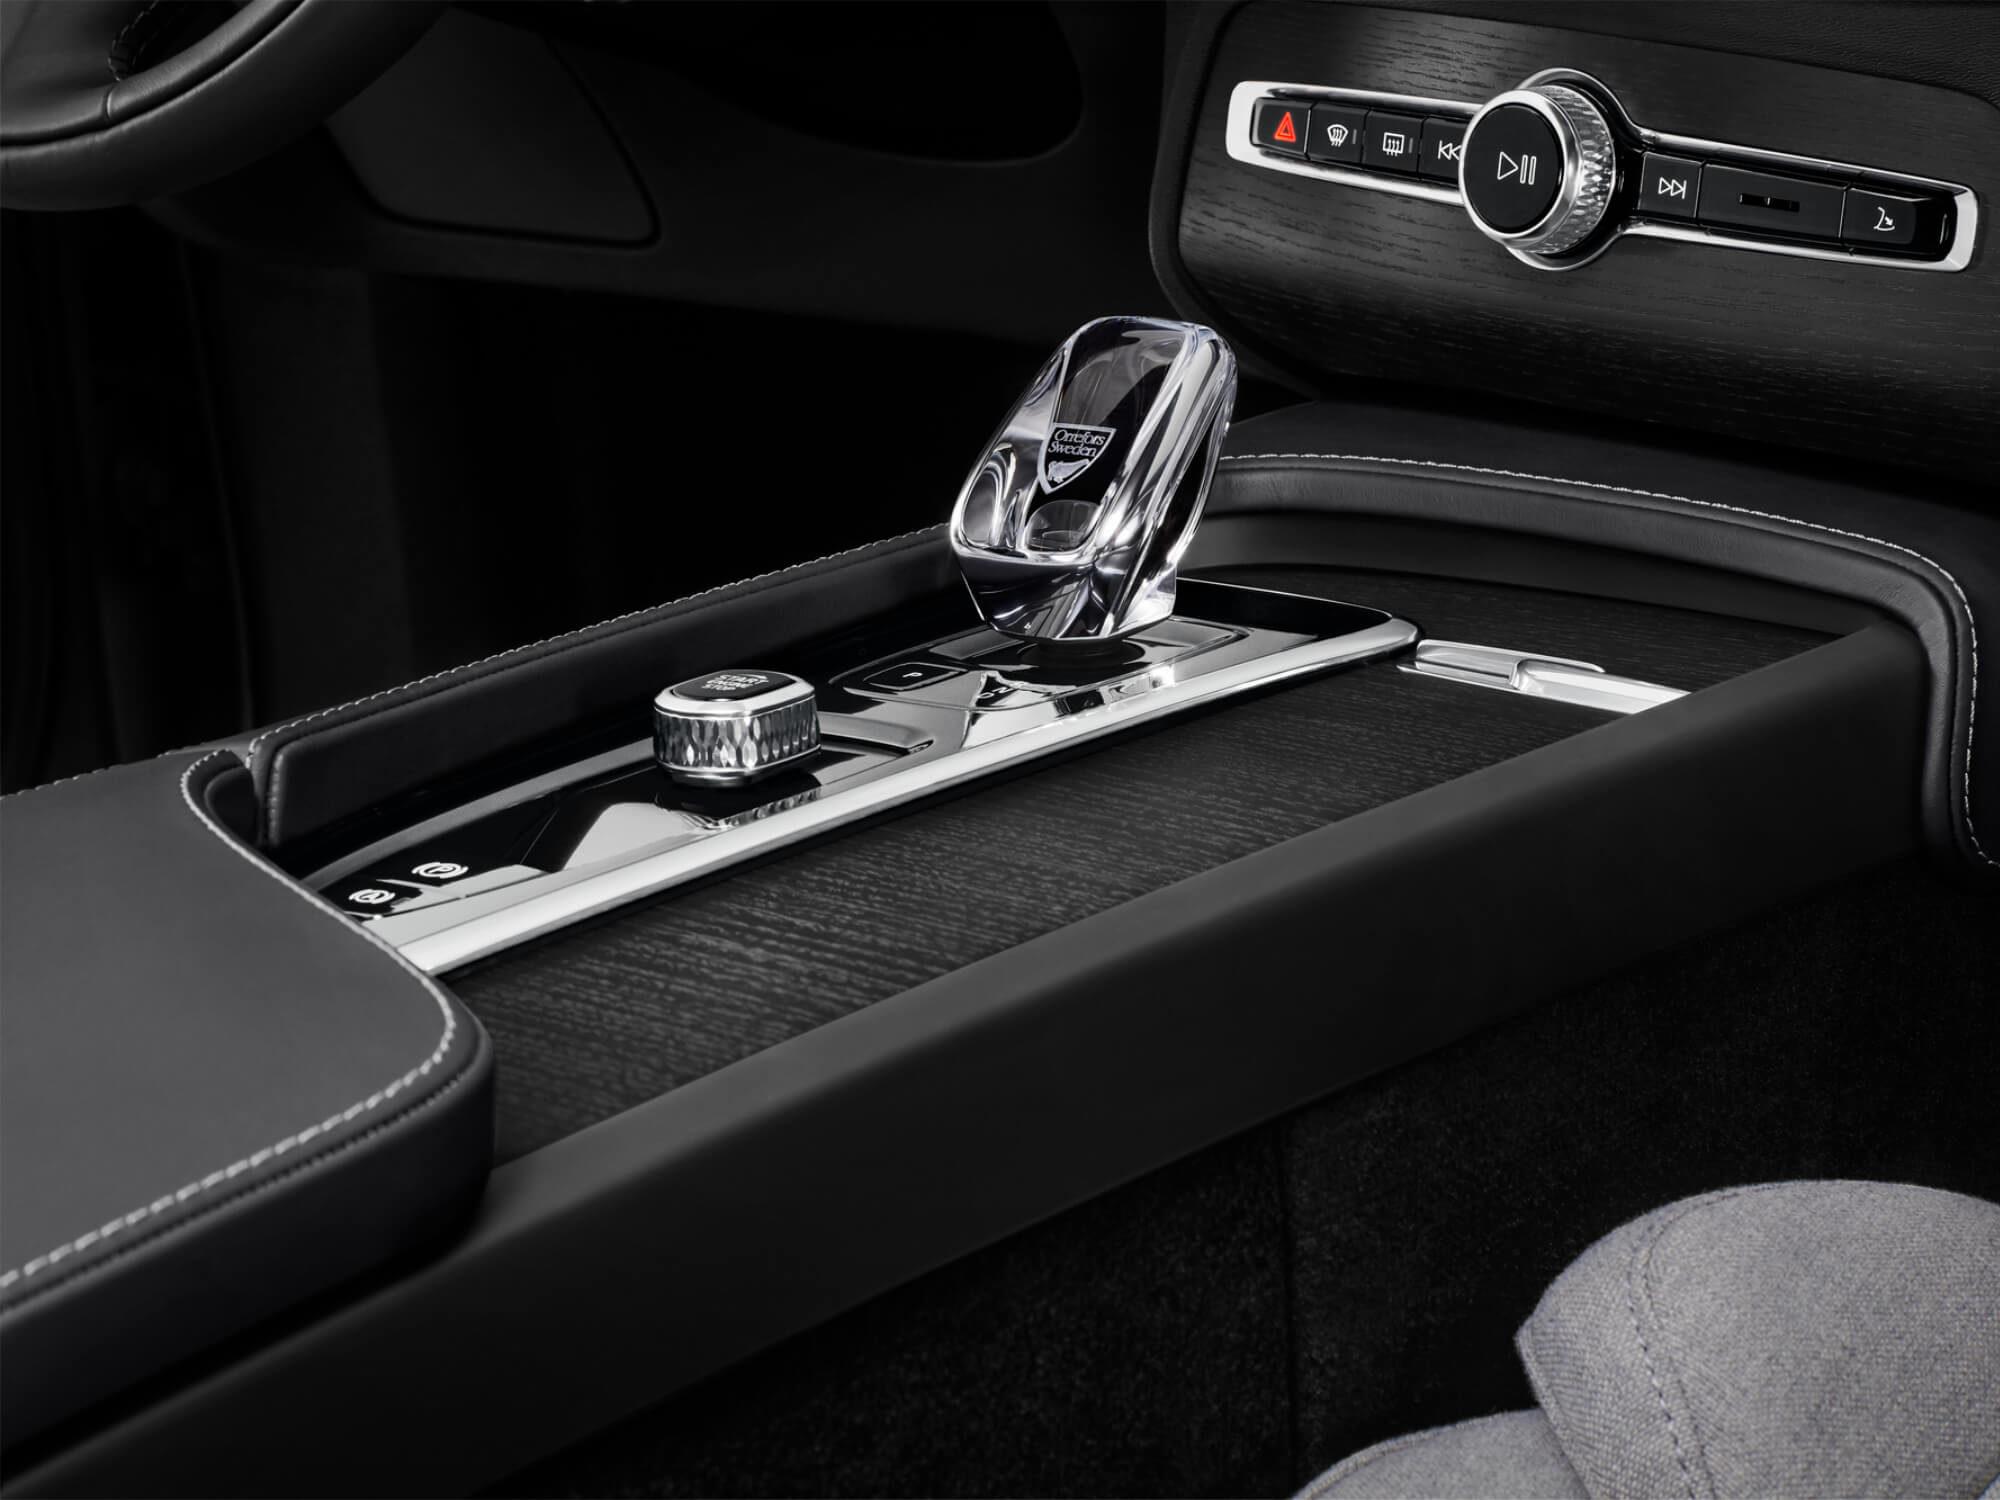 Volvo XC90 Plug-in Hybrid interieur